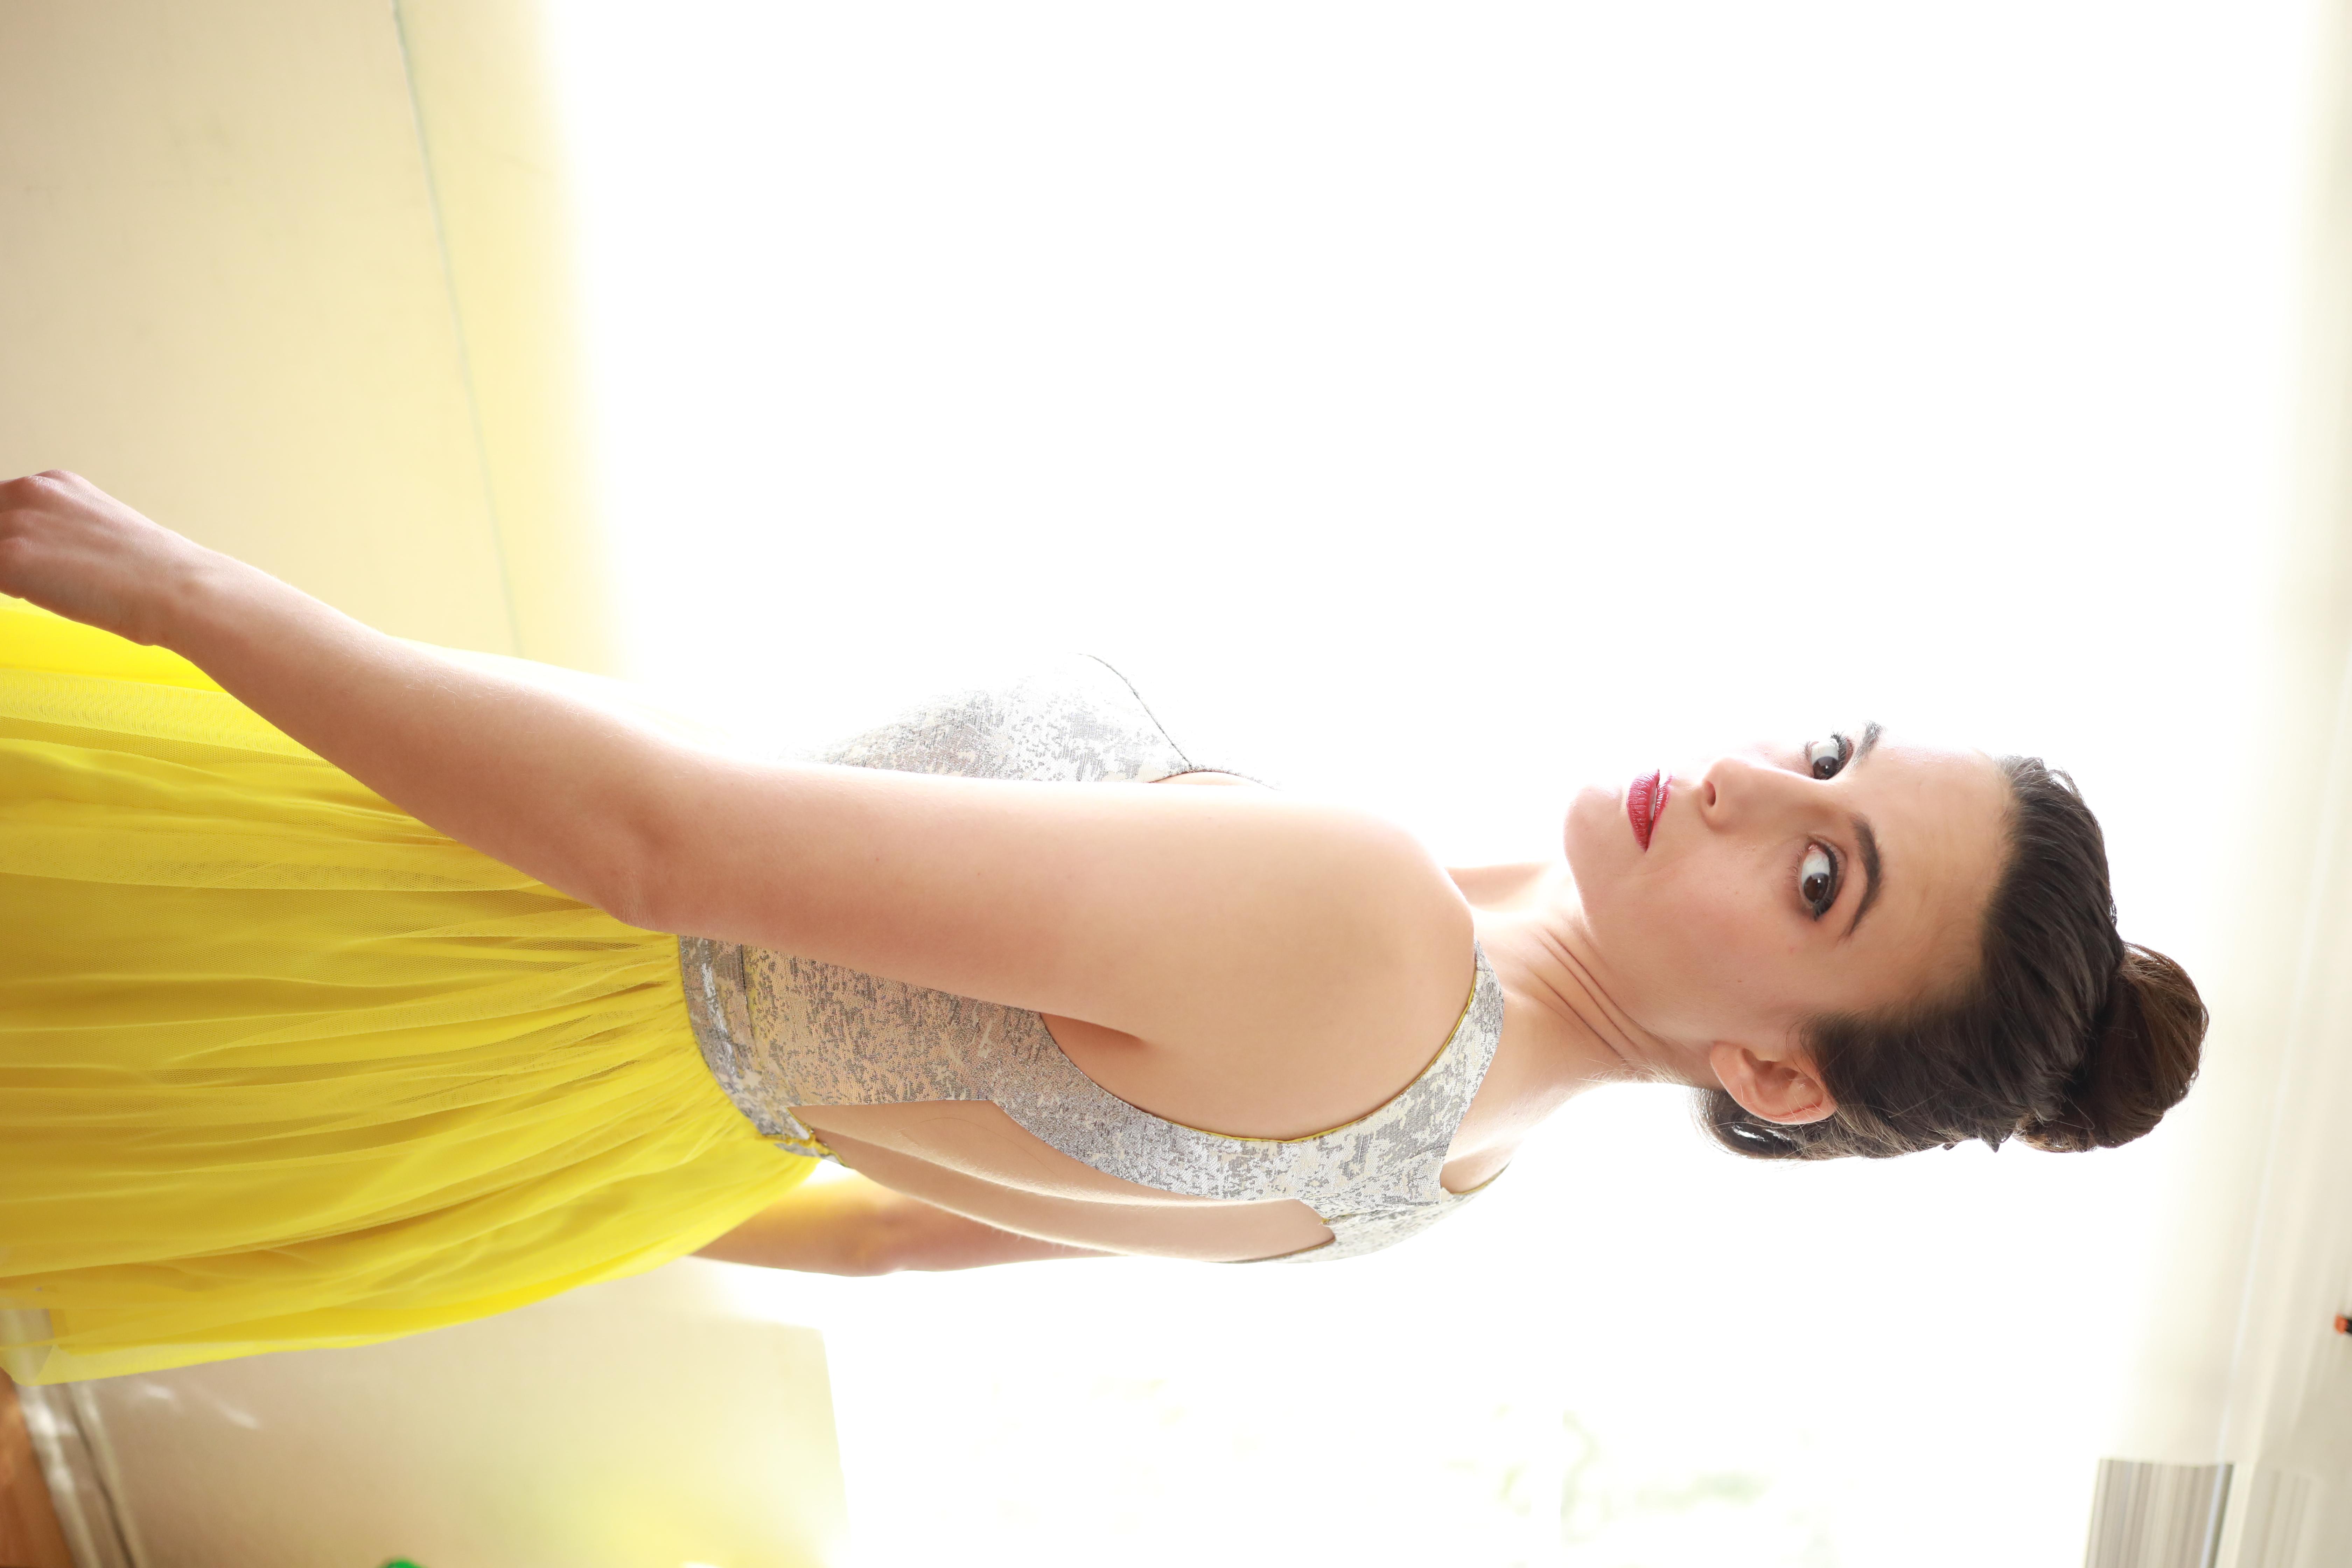 Mara Klein modeling